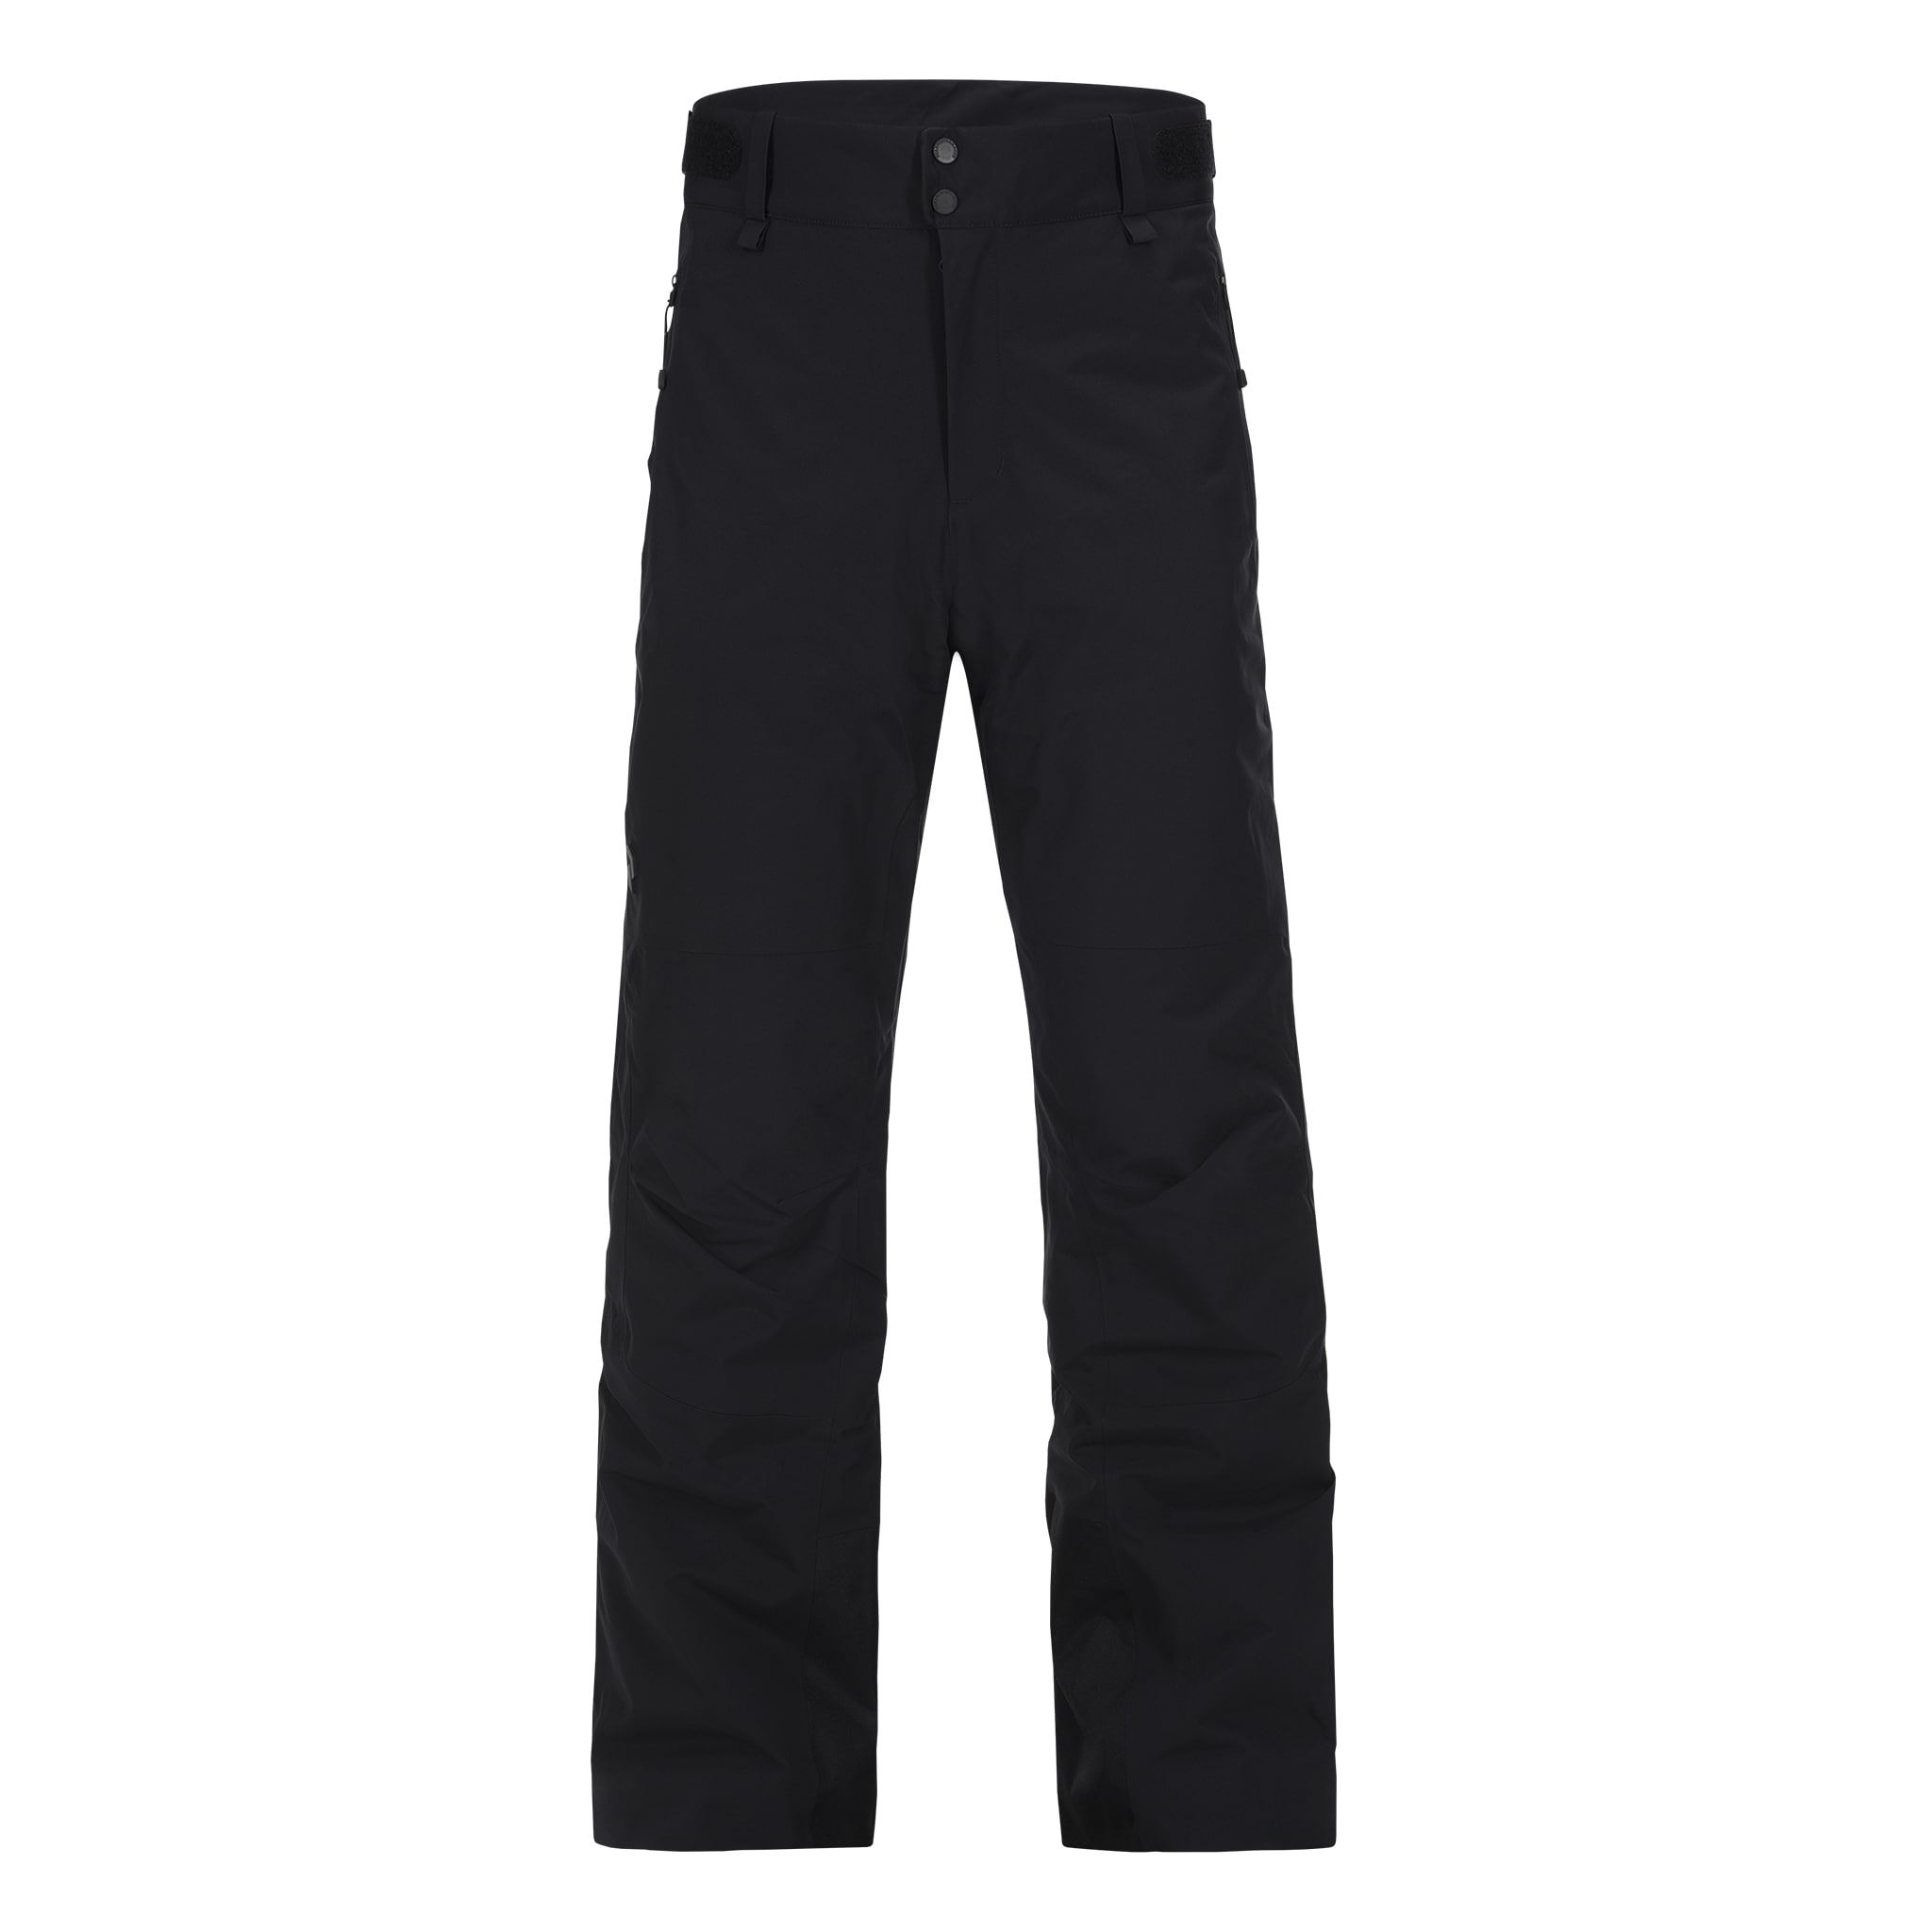 Maroon2 Pants